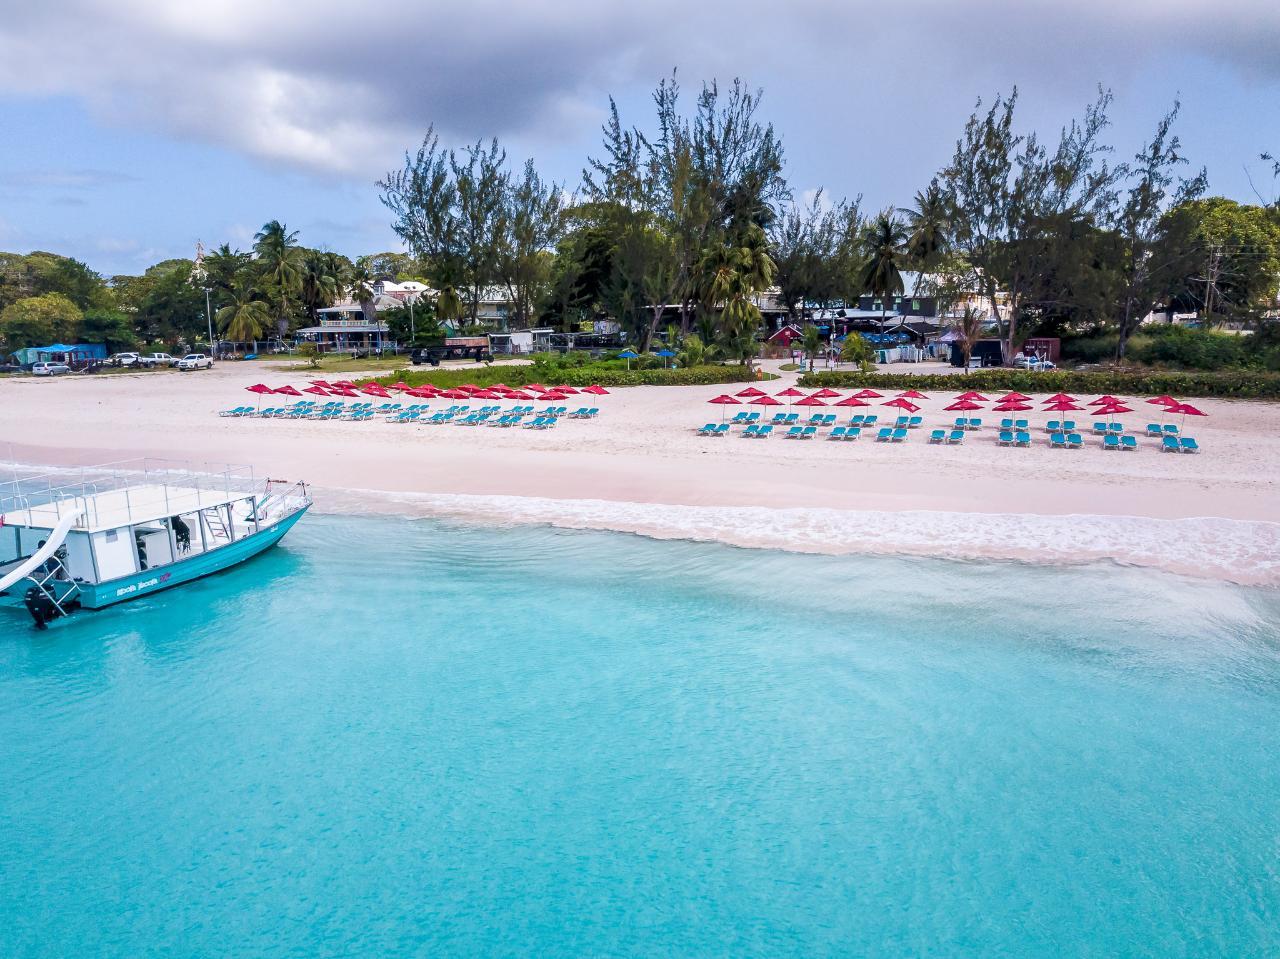 Beach Lounger & Turtle Snorkel Tour Combo